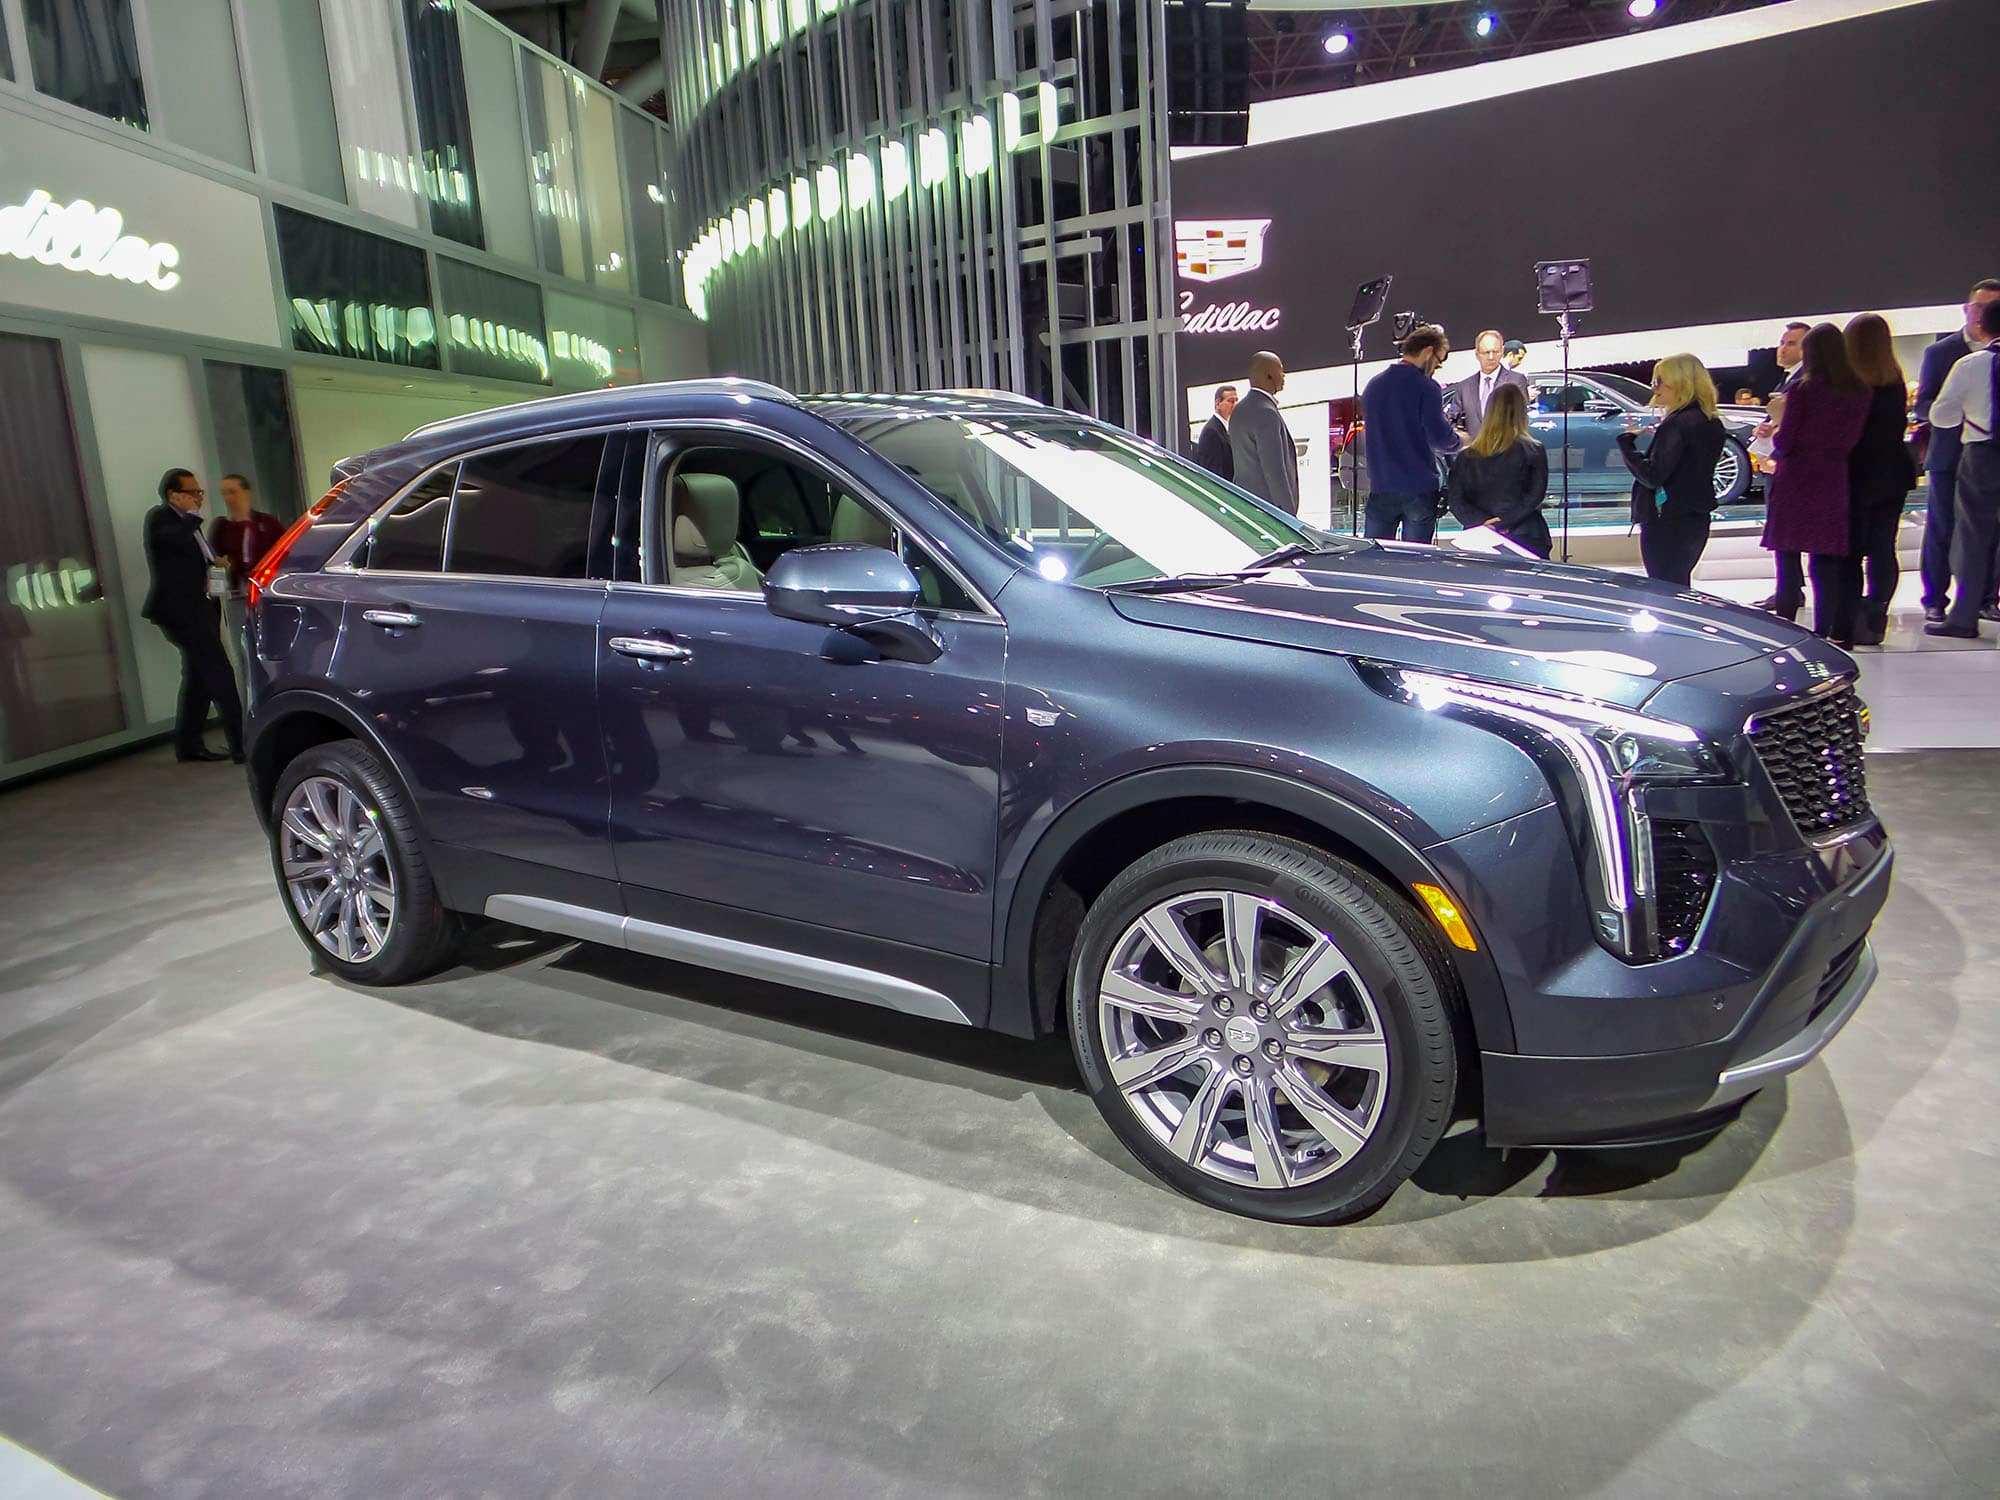 94 Concept of 2019 Cadillac Pics Performance for 2019 Cadillac Pics